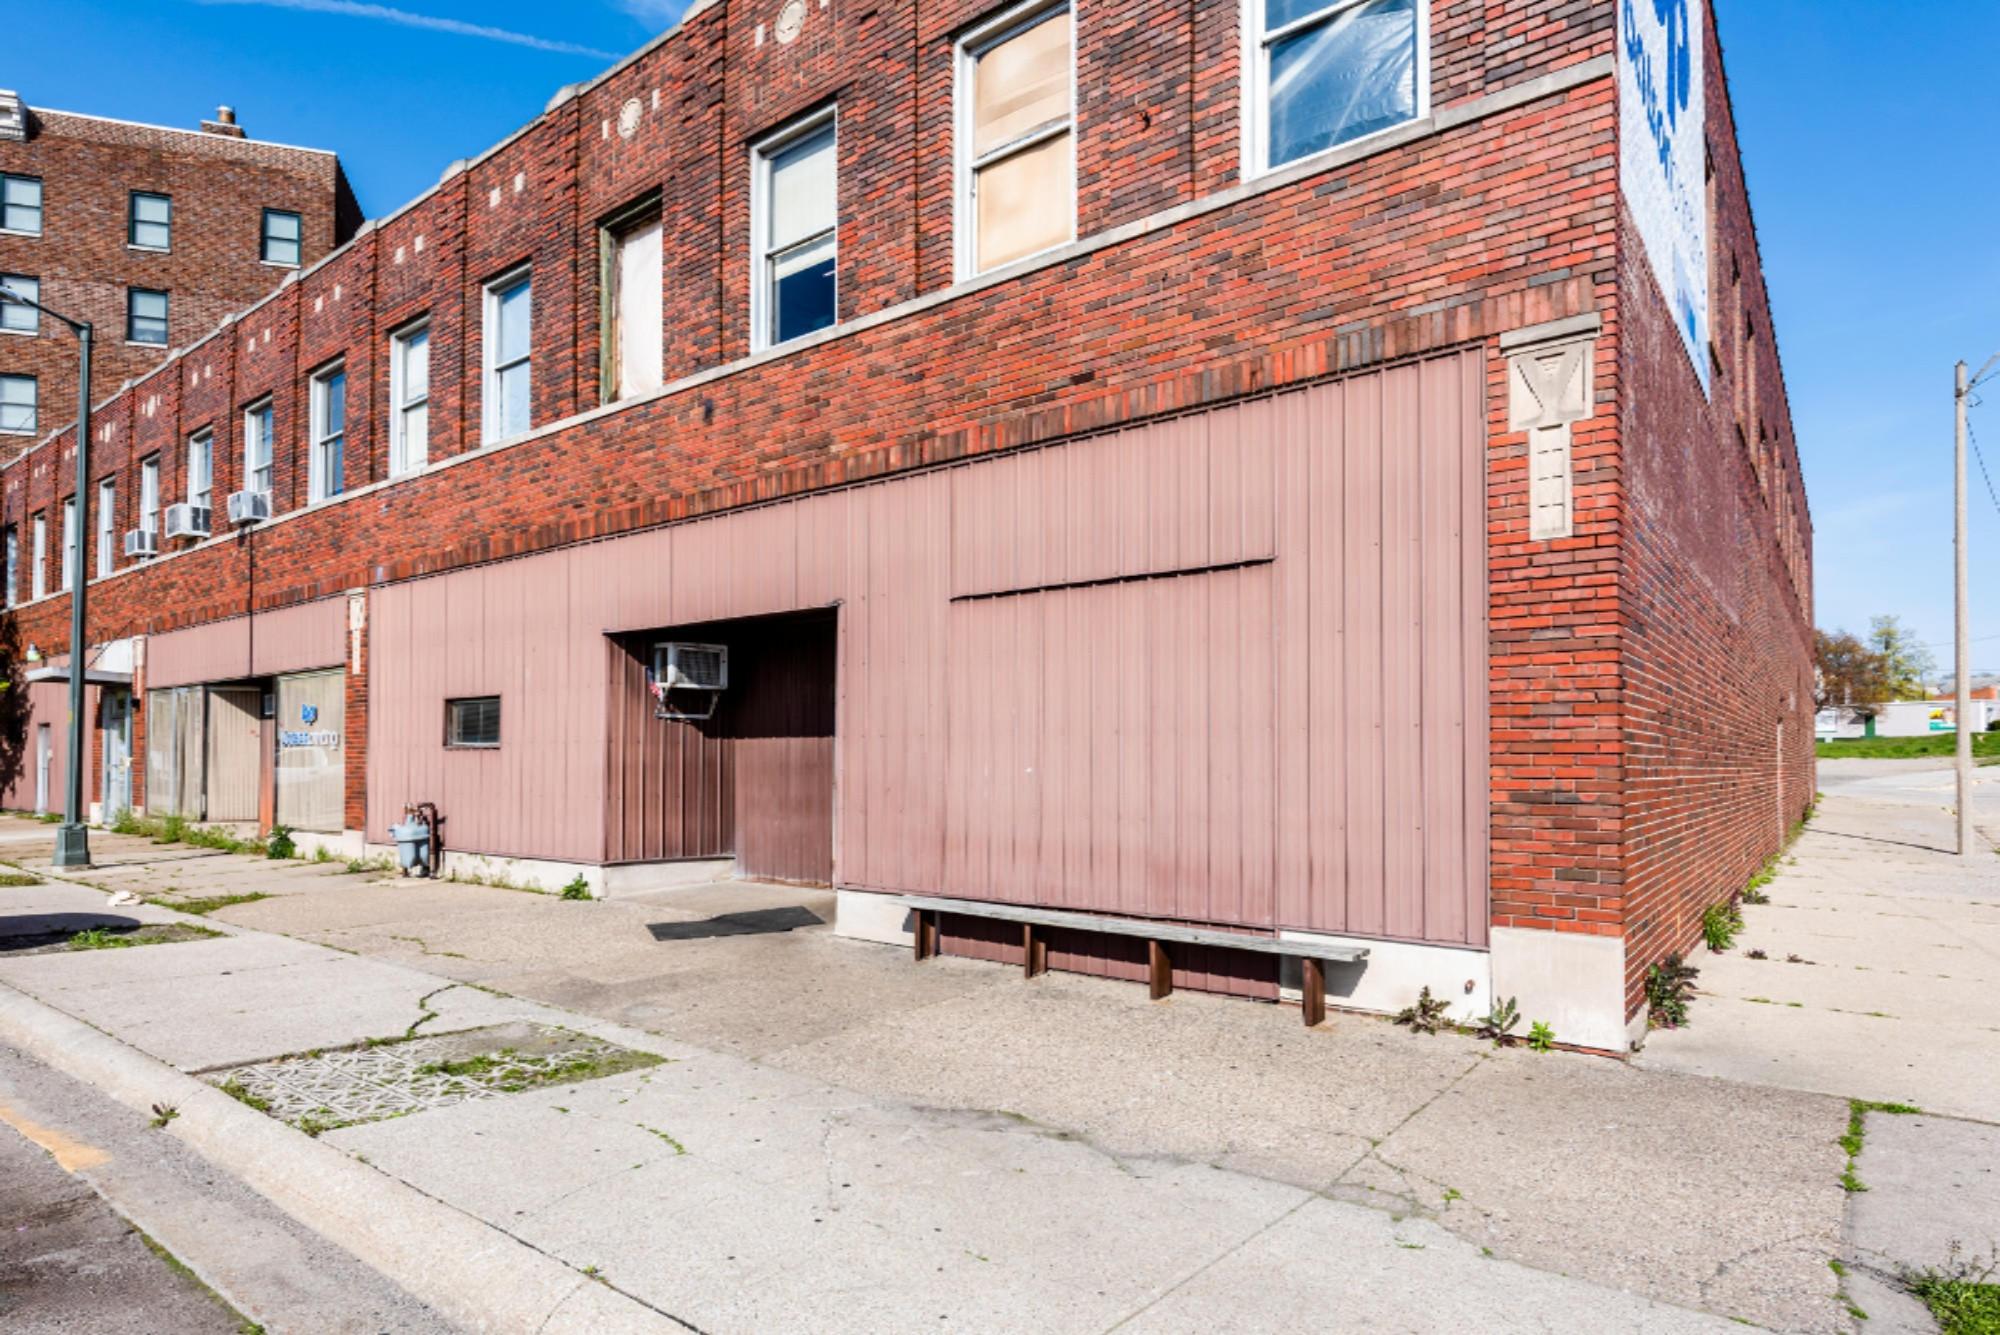 195 Michigan Street, Benton Harbor MI 49022 - Photo 2